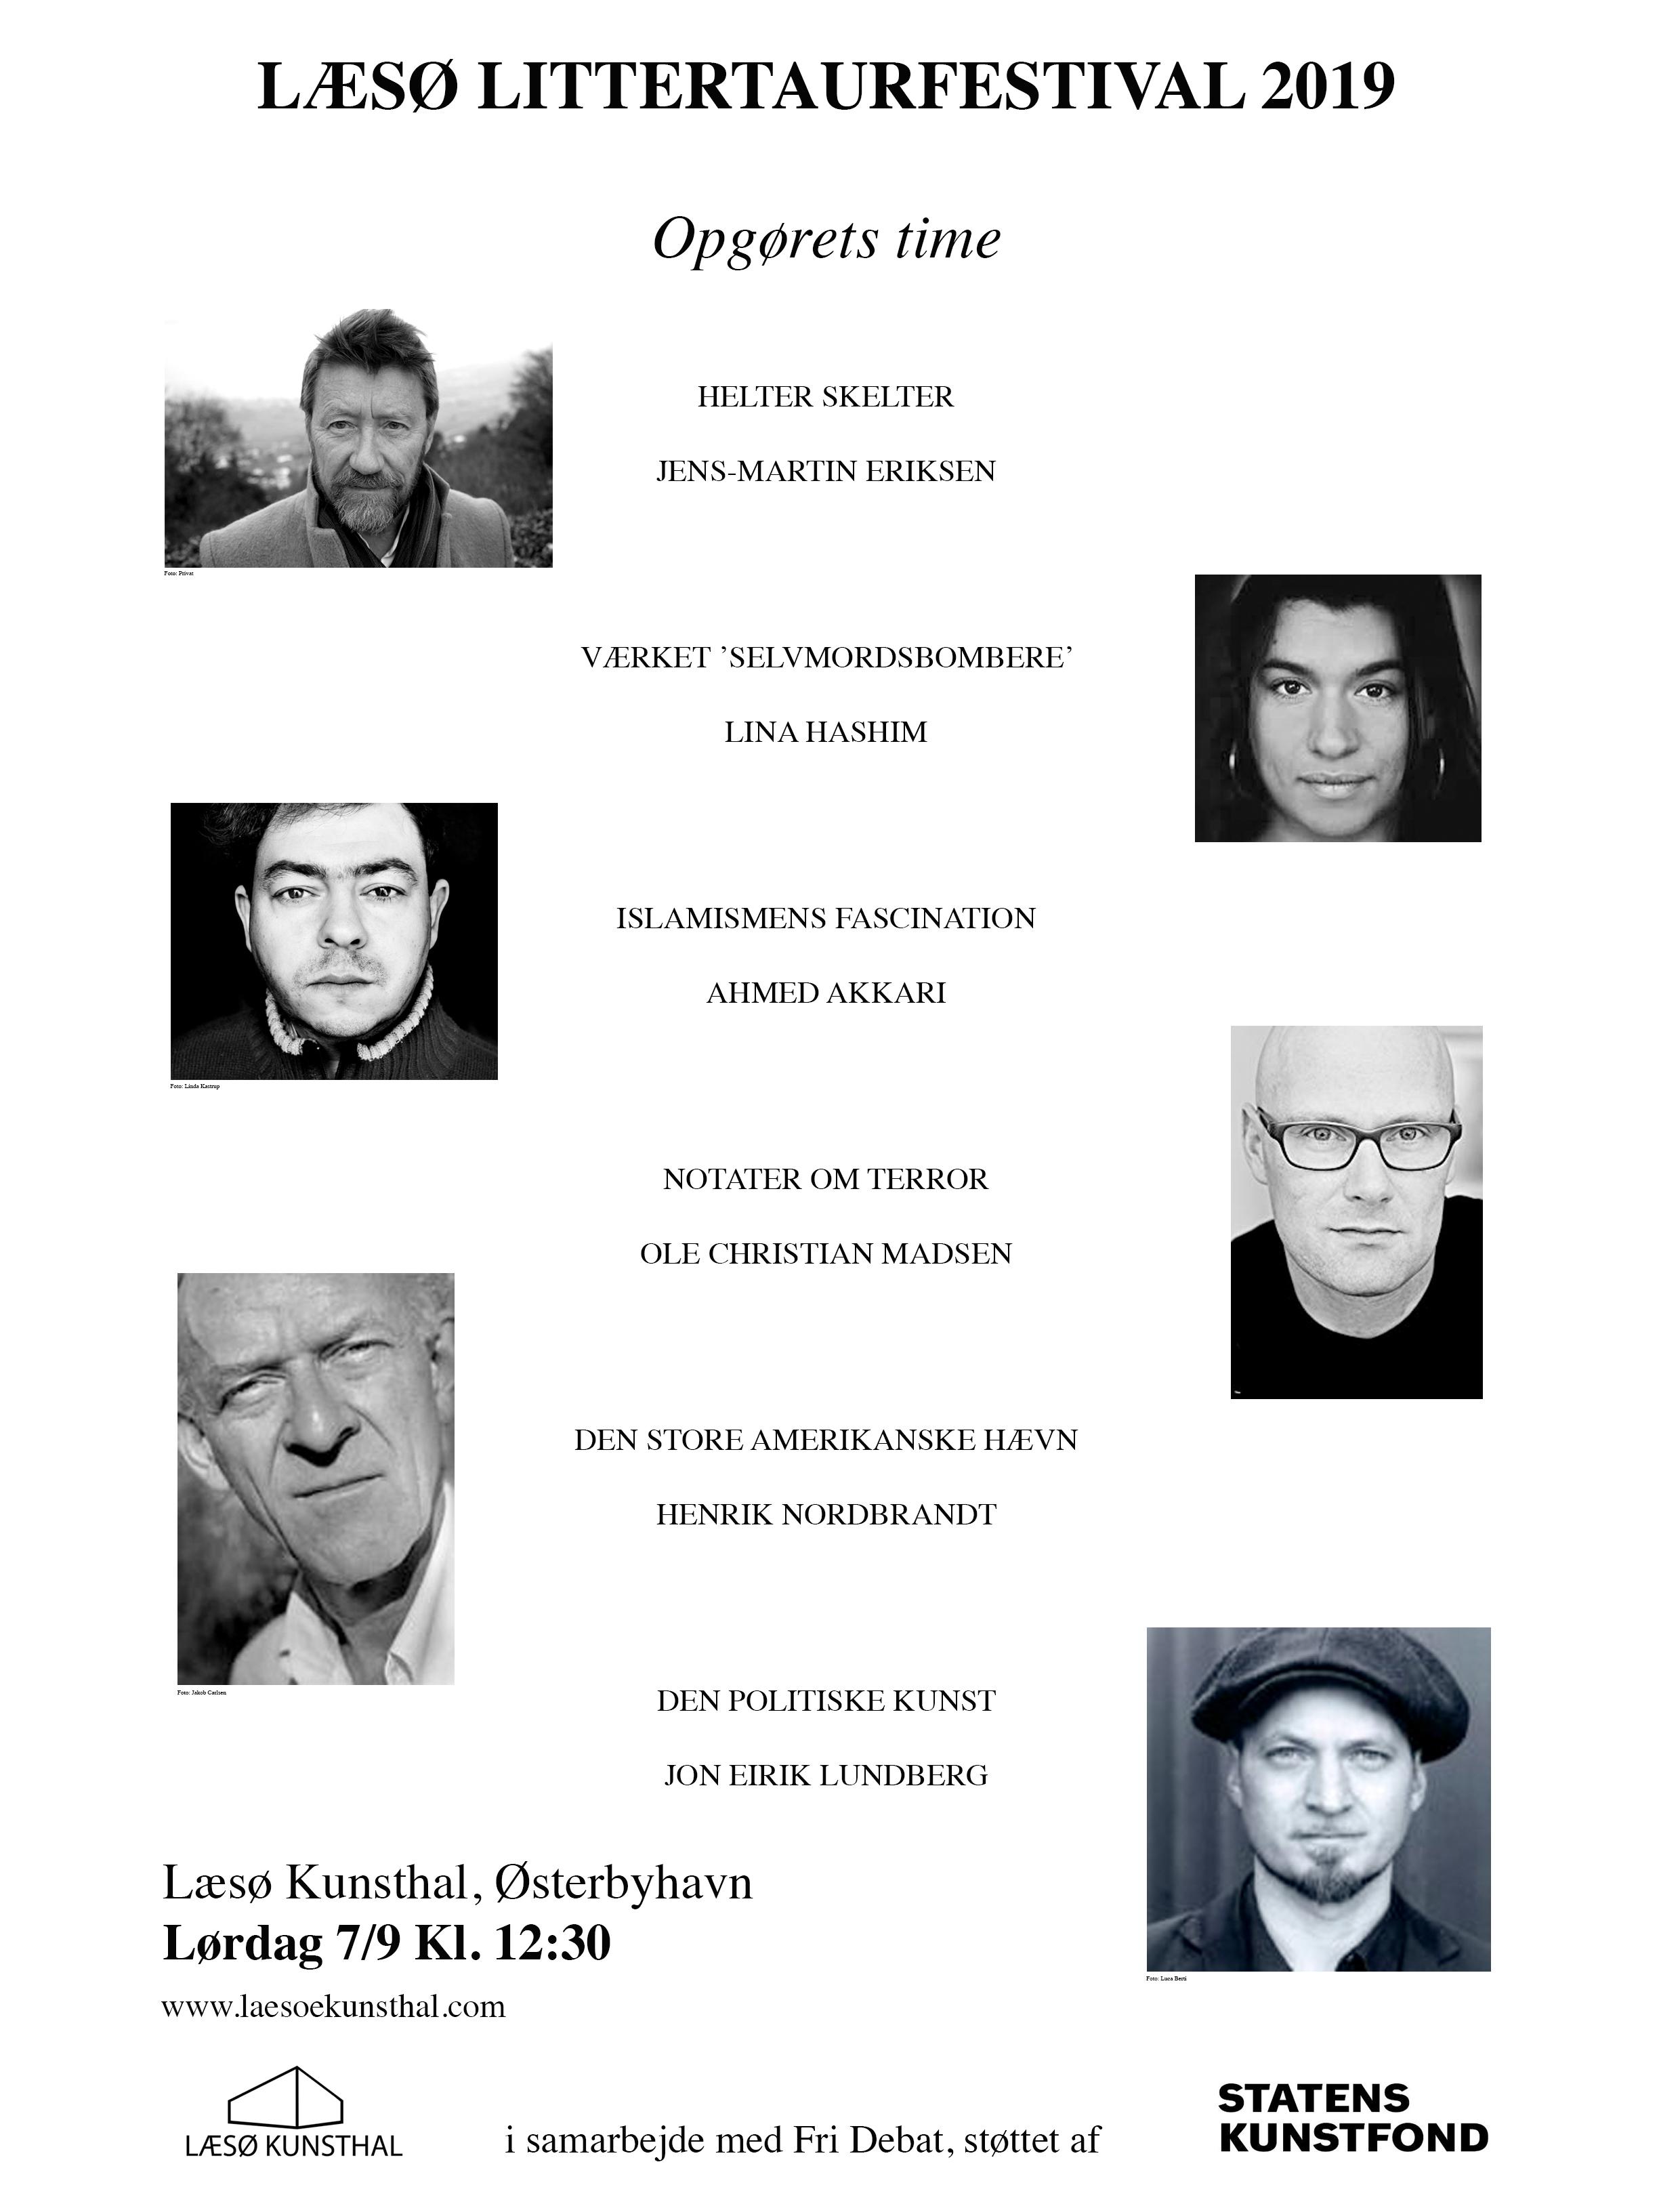 Plakat for Læsø Litteraturfestival 2019